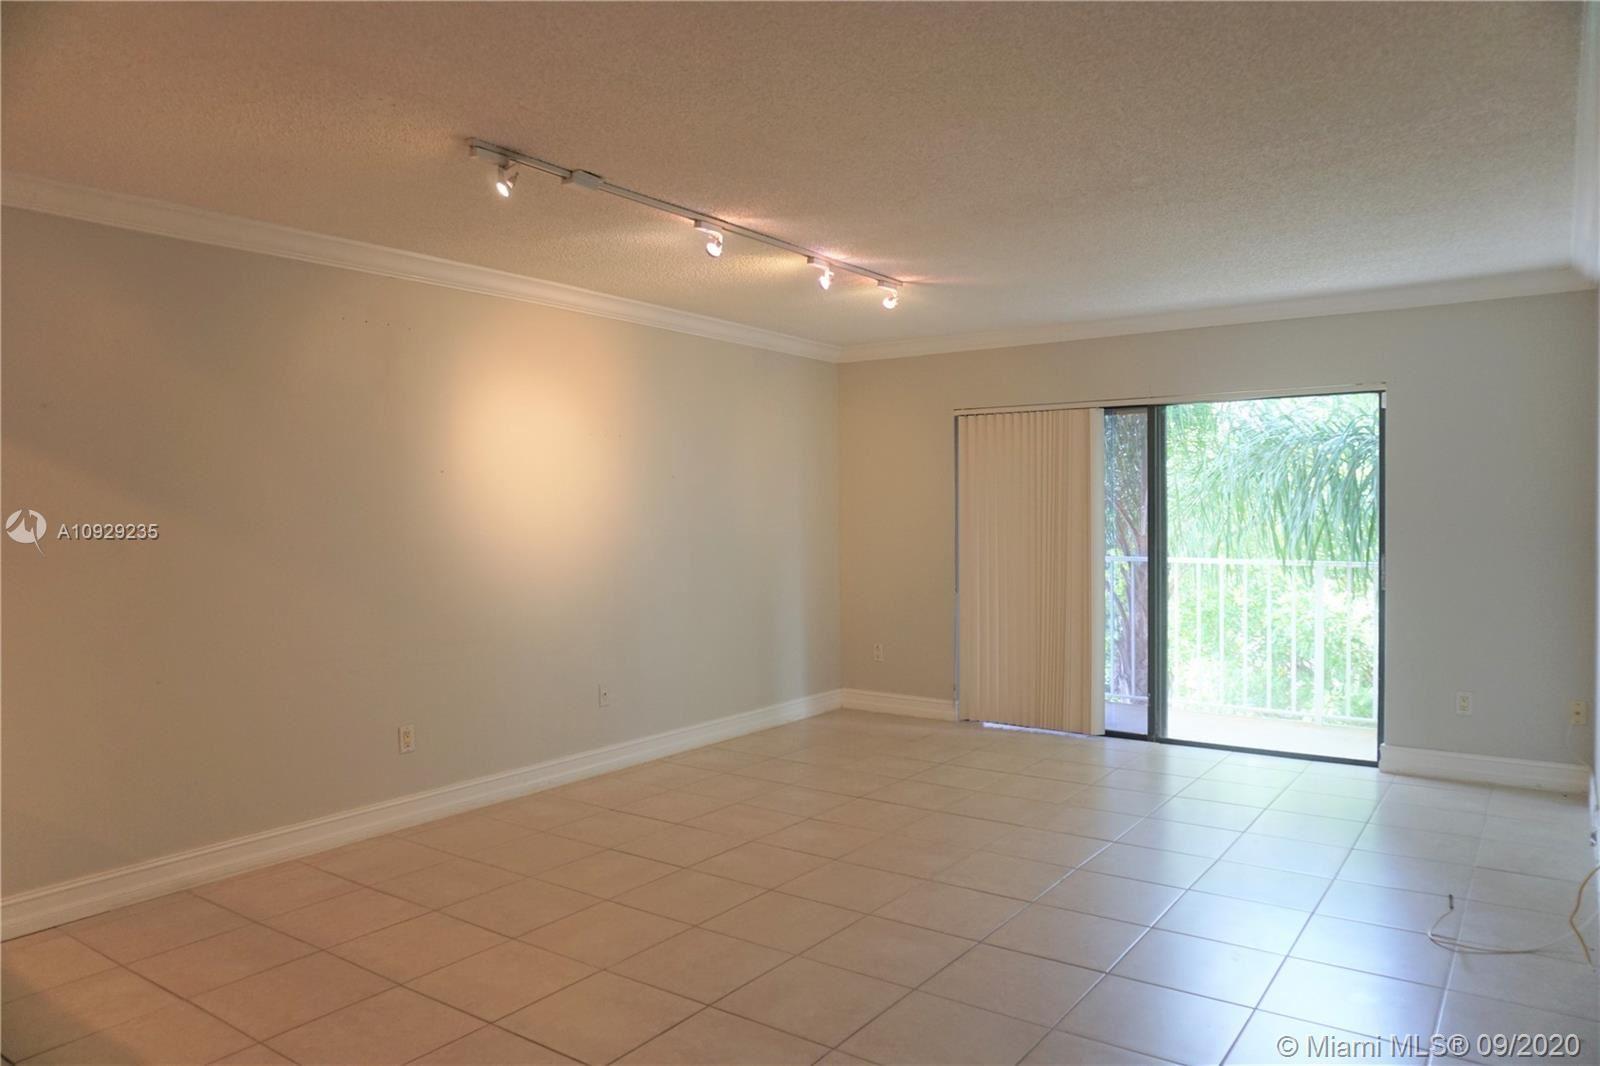 9301 SW 92nd Ave #B312, Miami, FL 33176 - #: A10929235